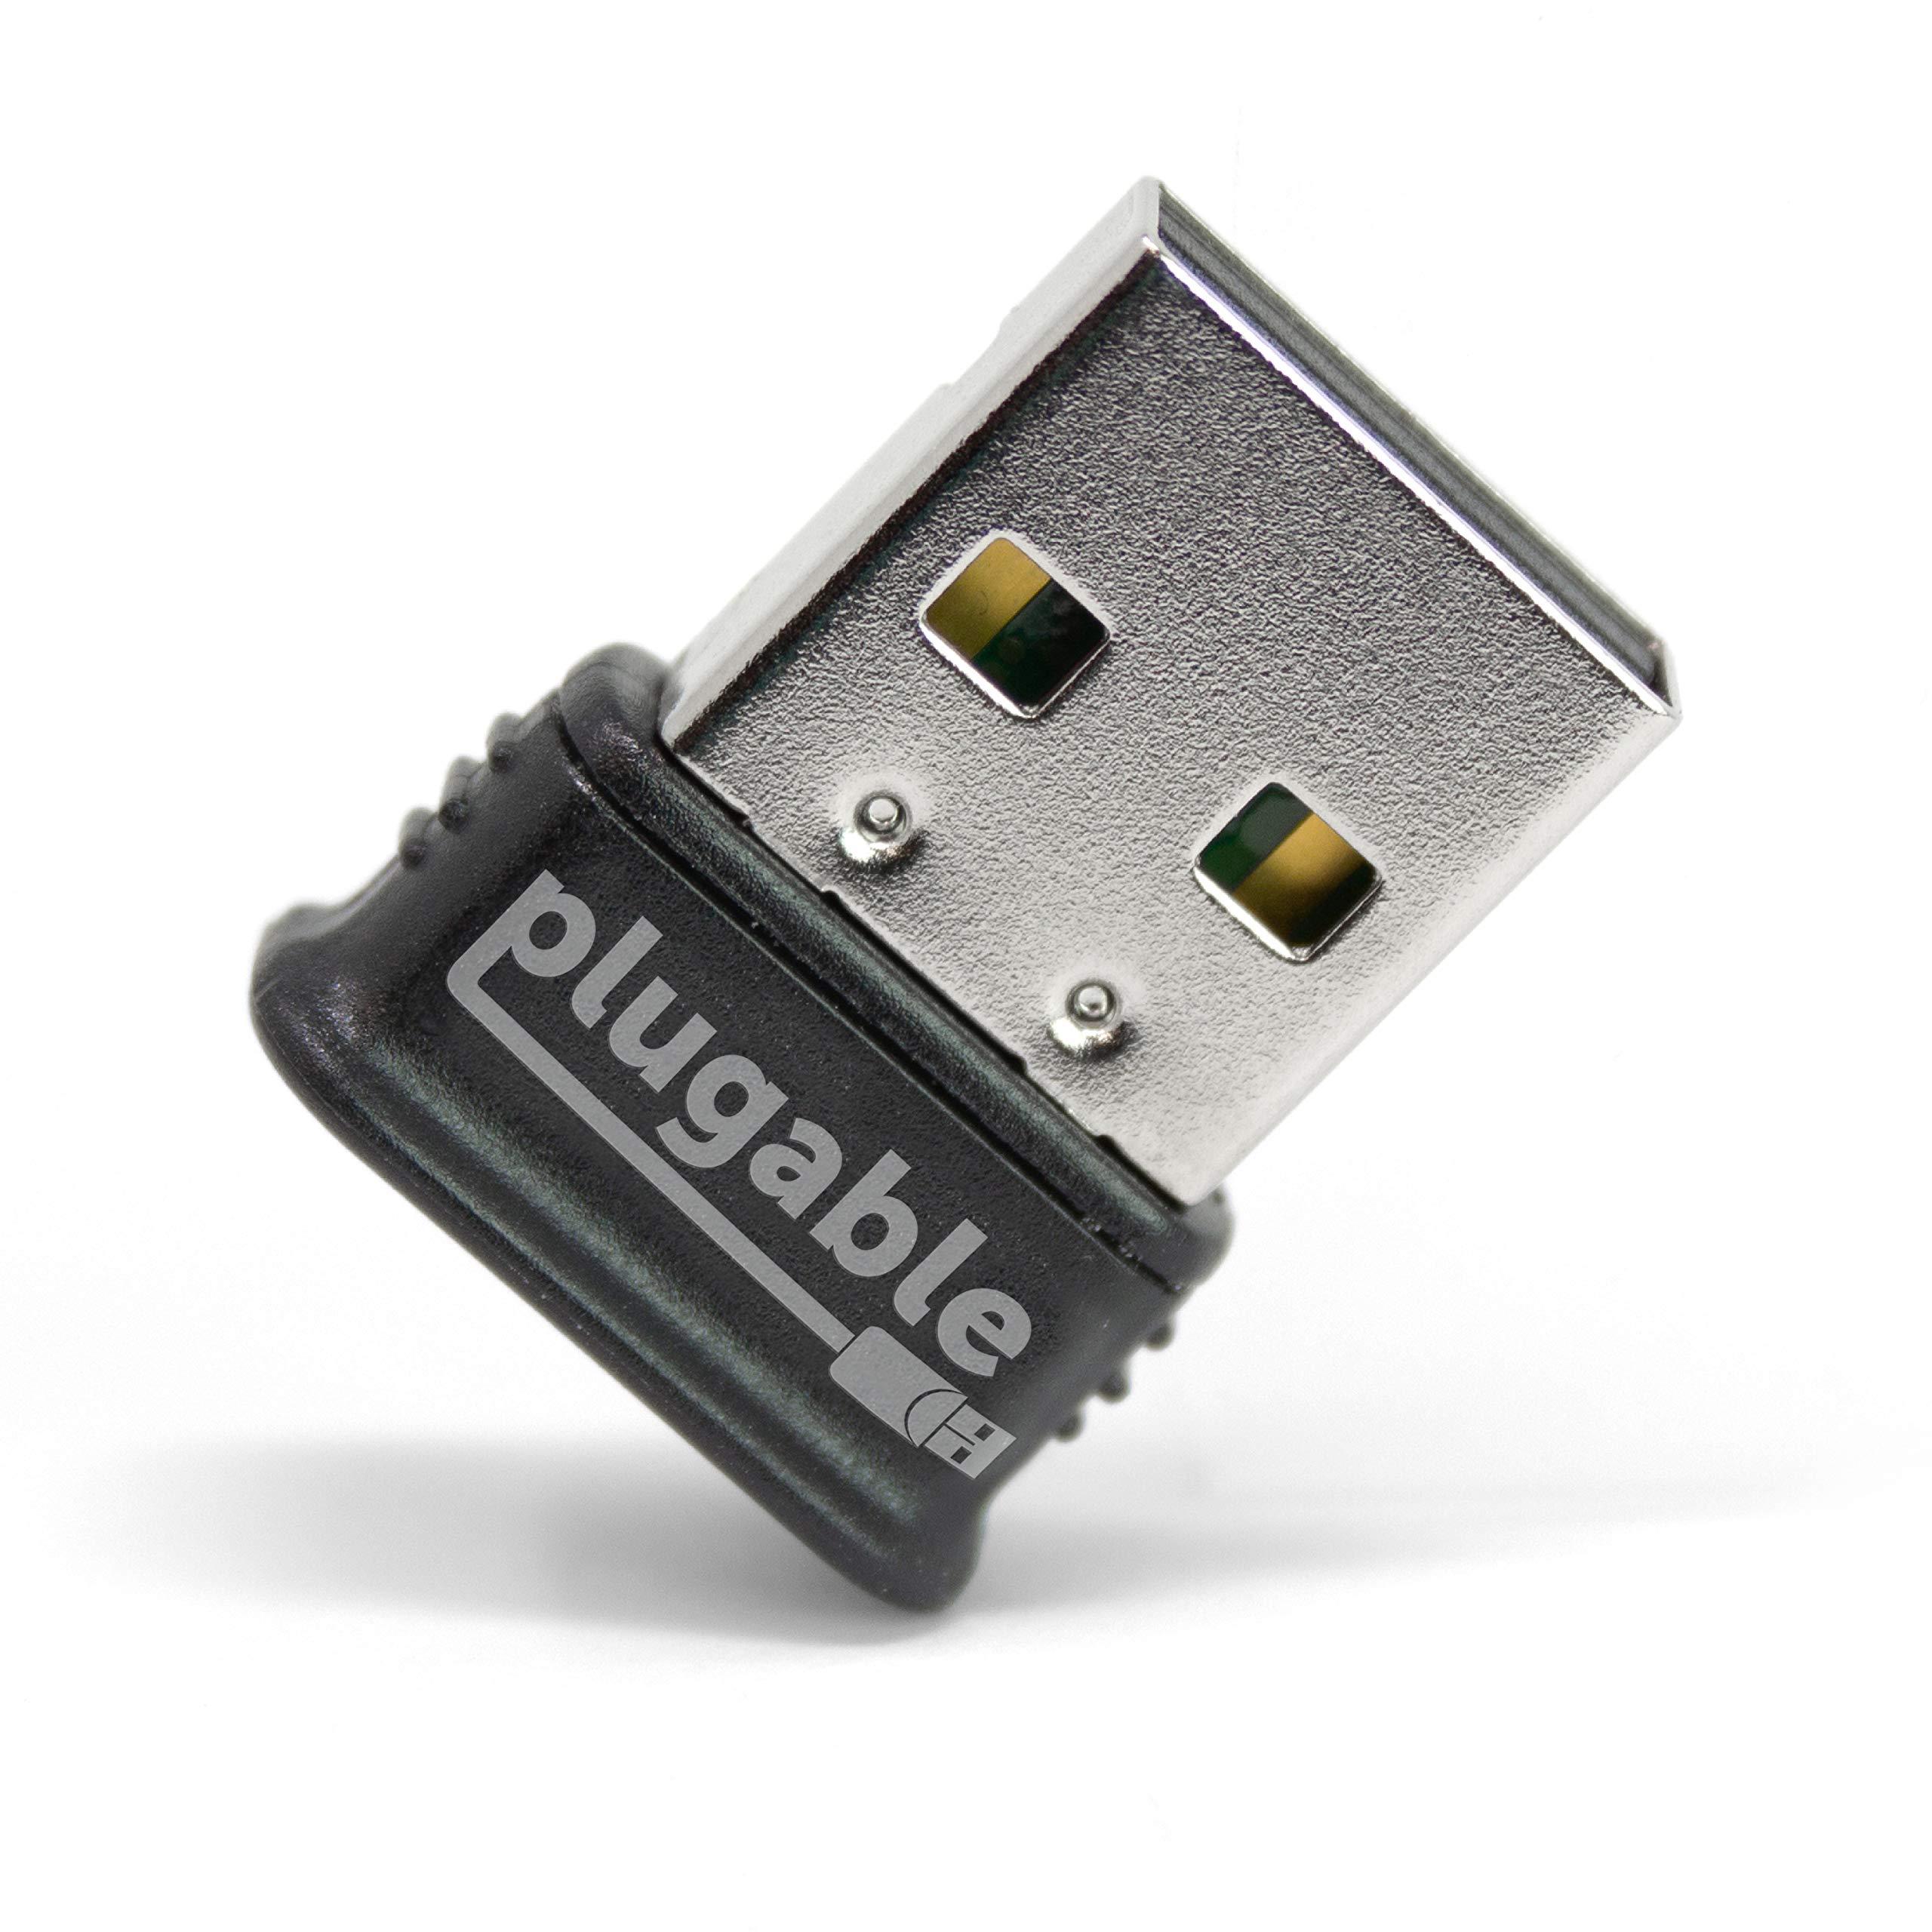 Kinivo BTD-400 Bluetooth 4.0 Low Energy USB Adapter For Windows 10//8.1//8 7 //